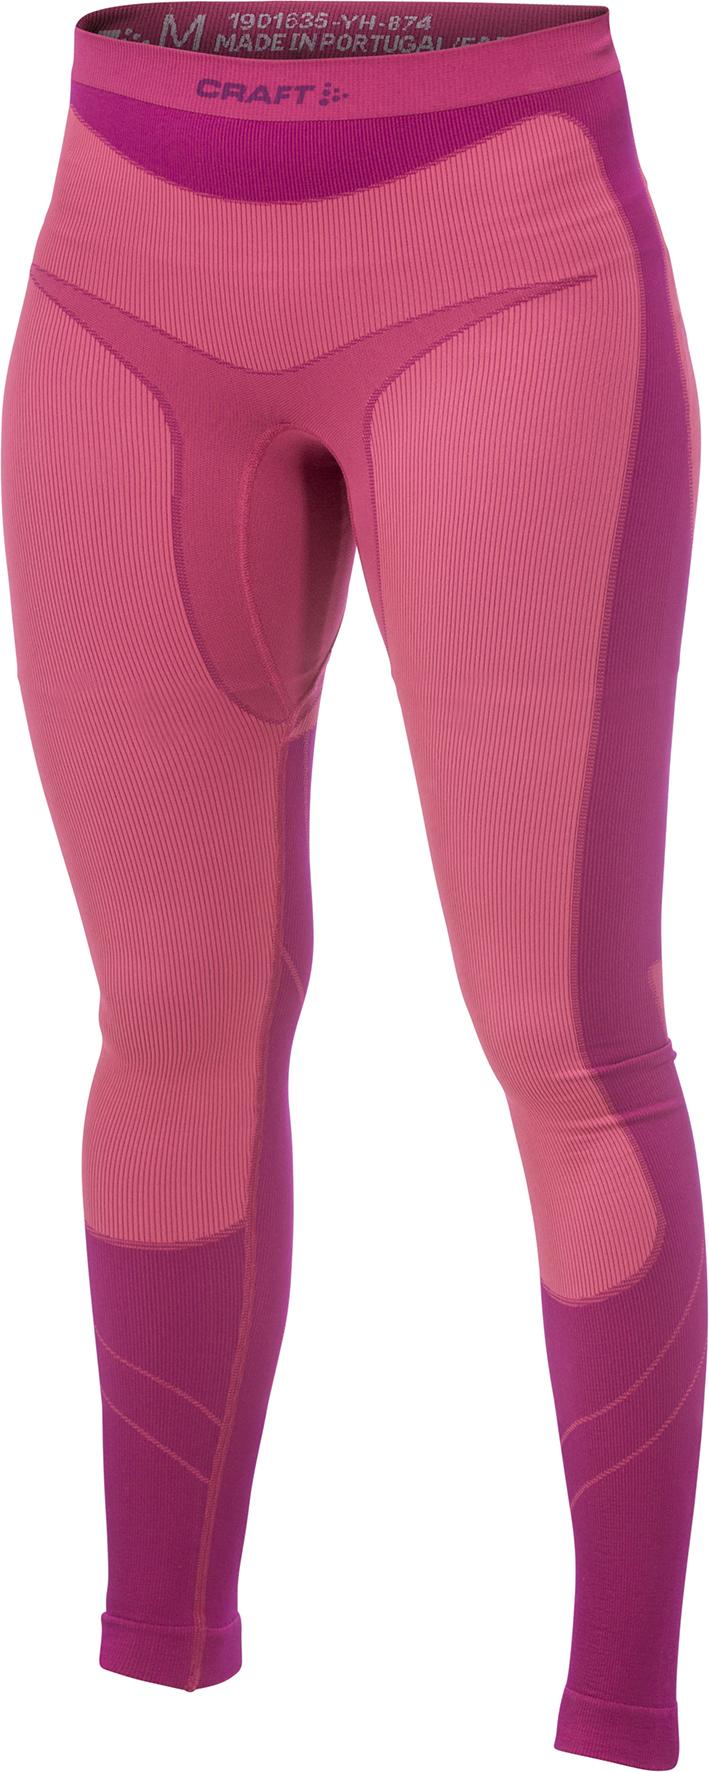 Женское термобелье рейтузы Craft Warm Pink (1901635-2465)